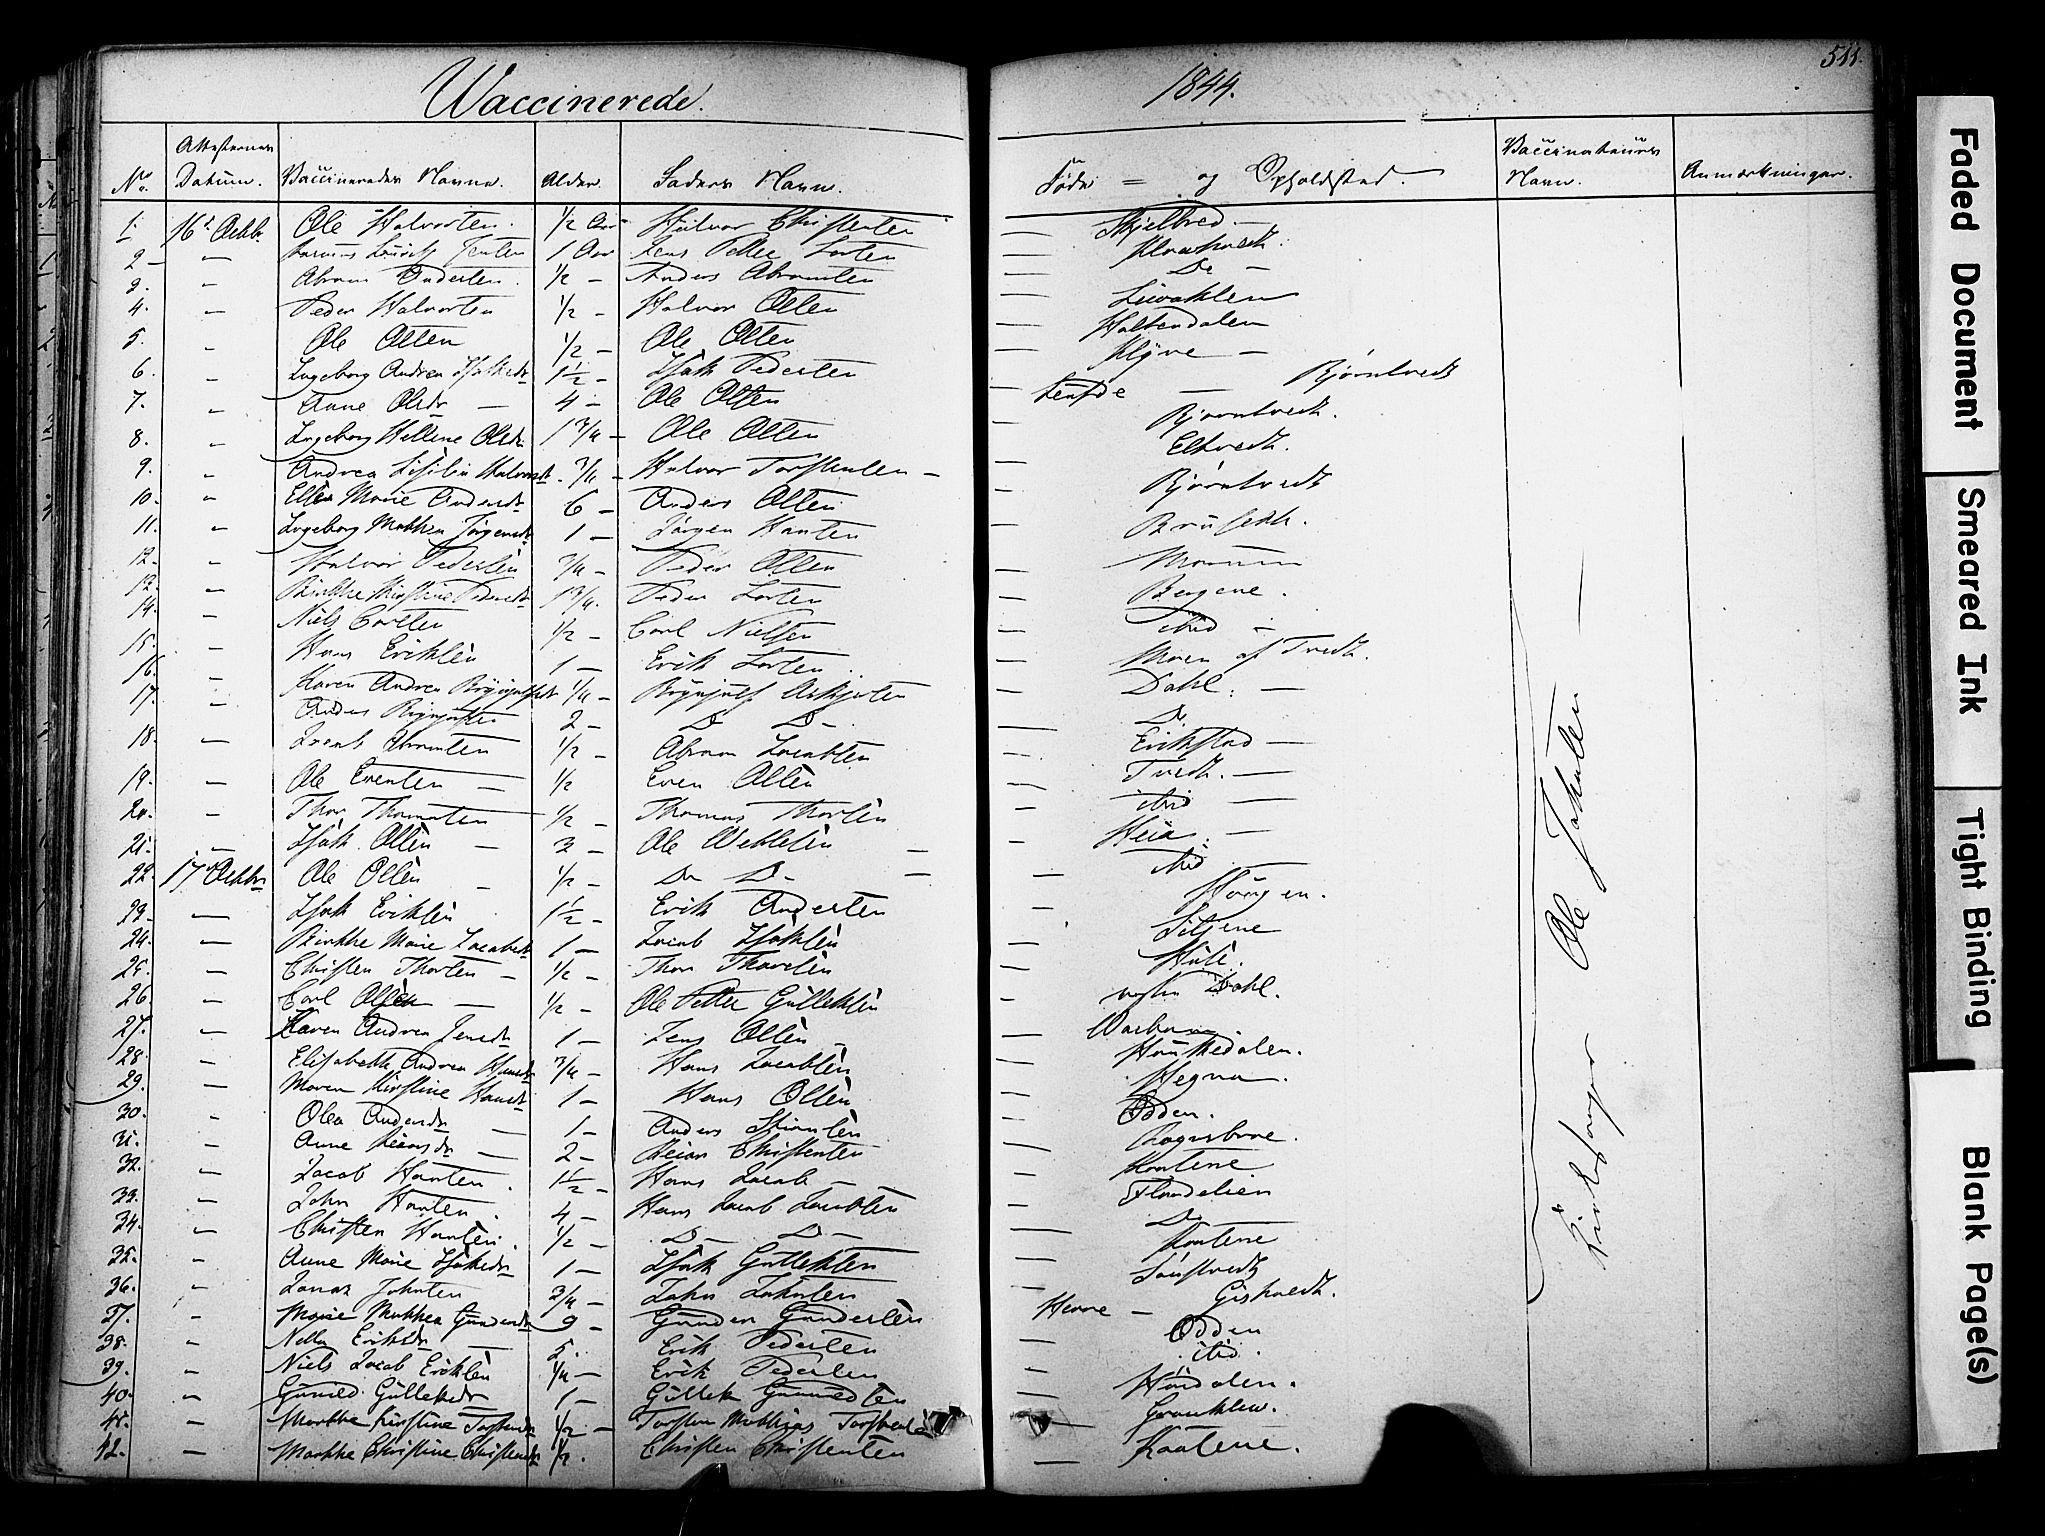 SAKO, Solum kirkebøker, F/Fa/L0006: Ministerialbok nr. I 6, 1844-1855, s. 511